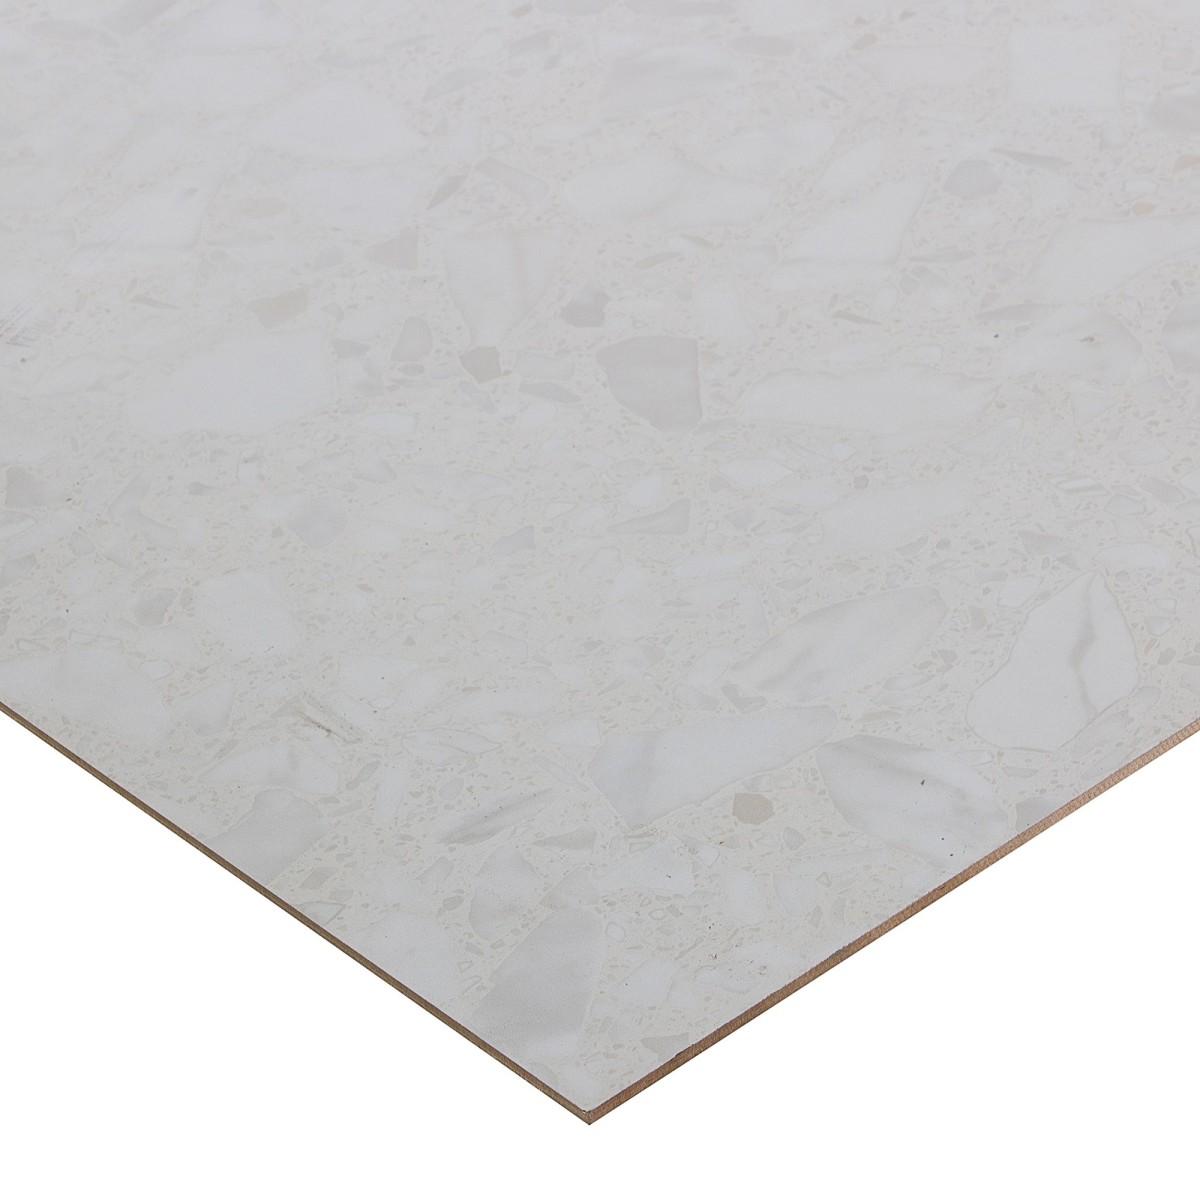 Стеновая панель №905 305х0.4x60 см МДФ цвет камень